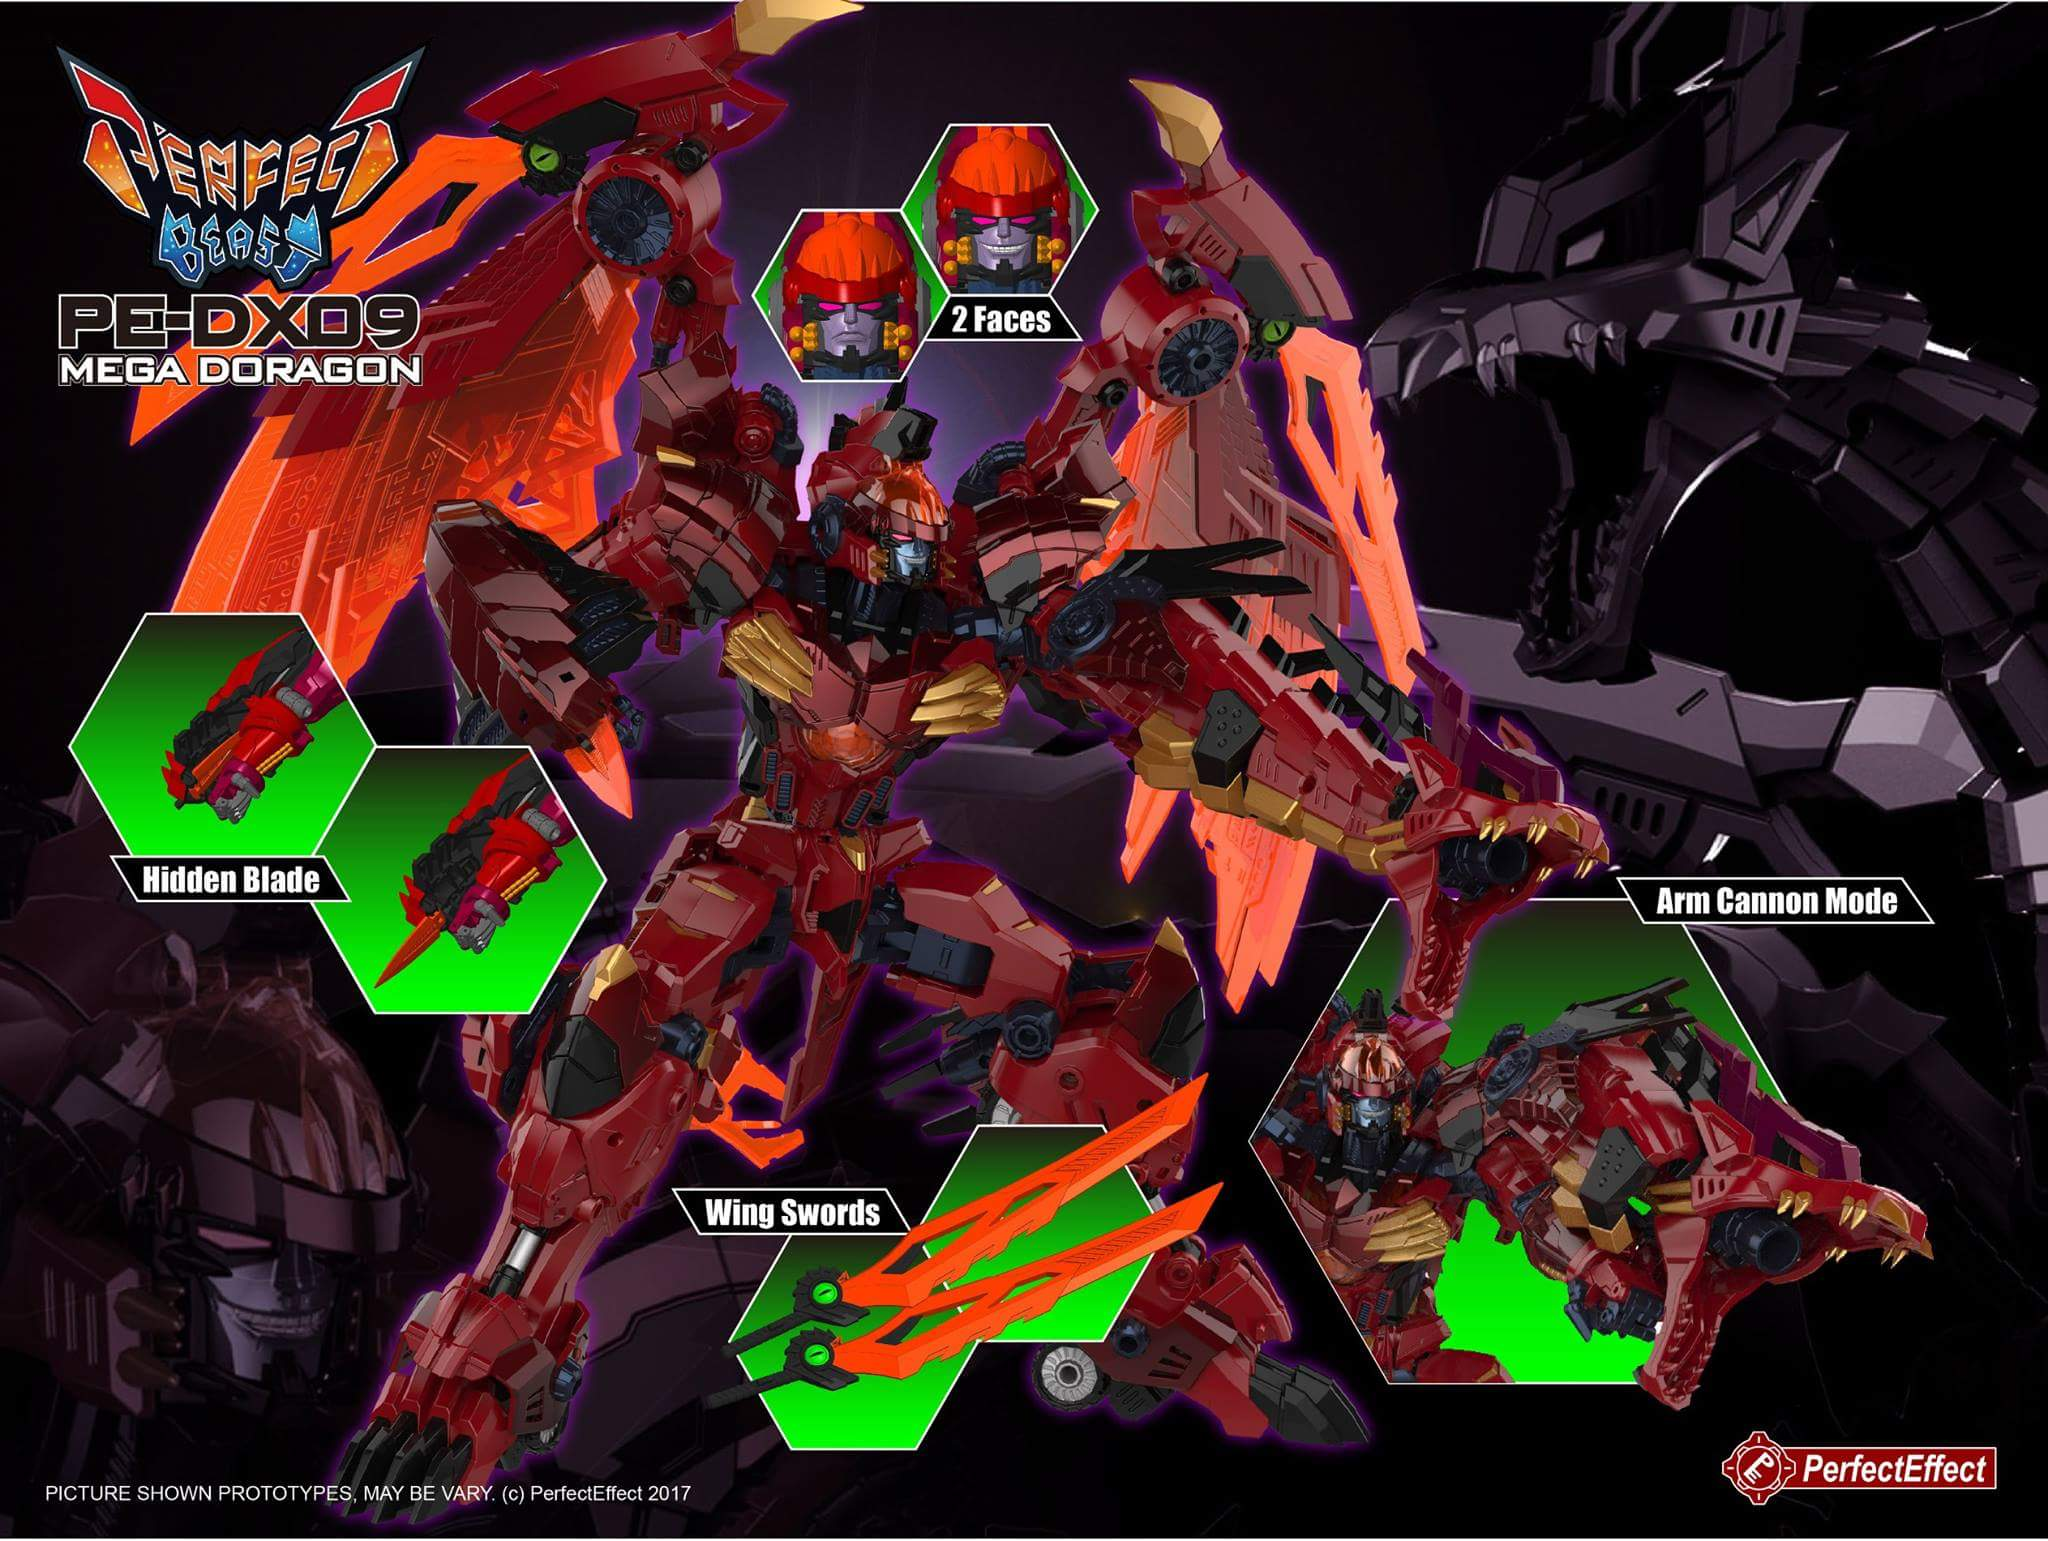 [PerfectEffect] Produit Tiers - Gamme DX - Basé sur Beast Wars et Beast Wars II - Page 3 ZcKYKSv9_o